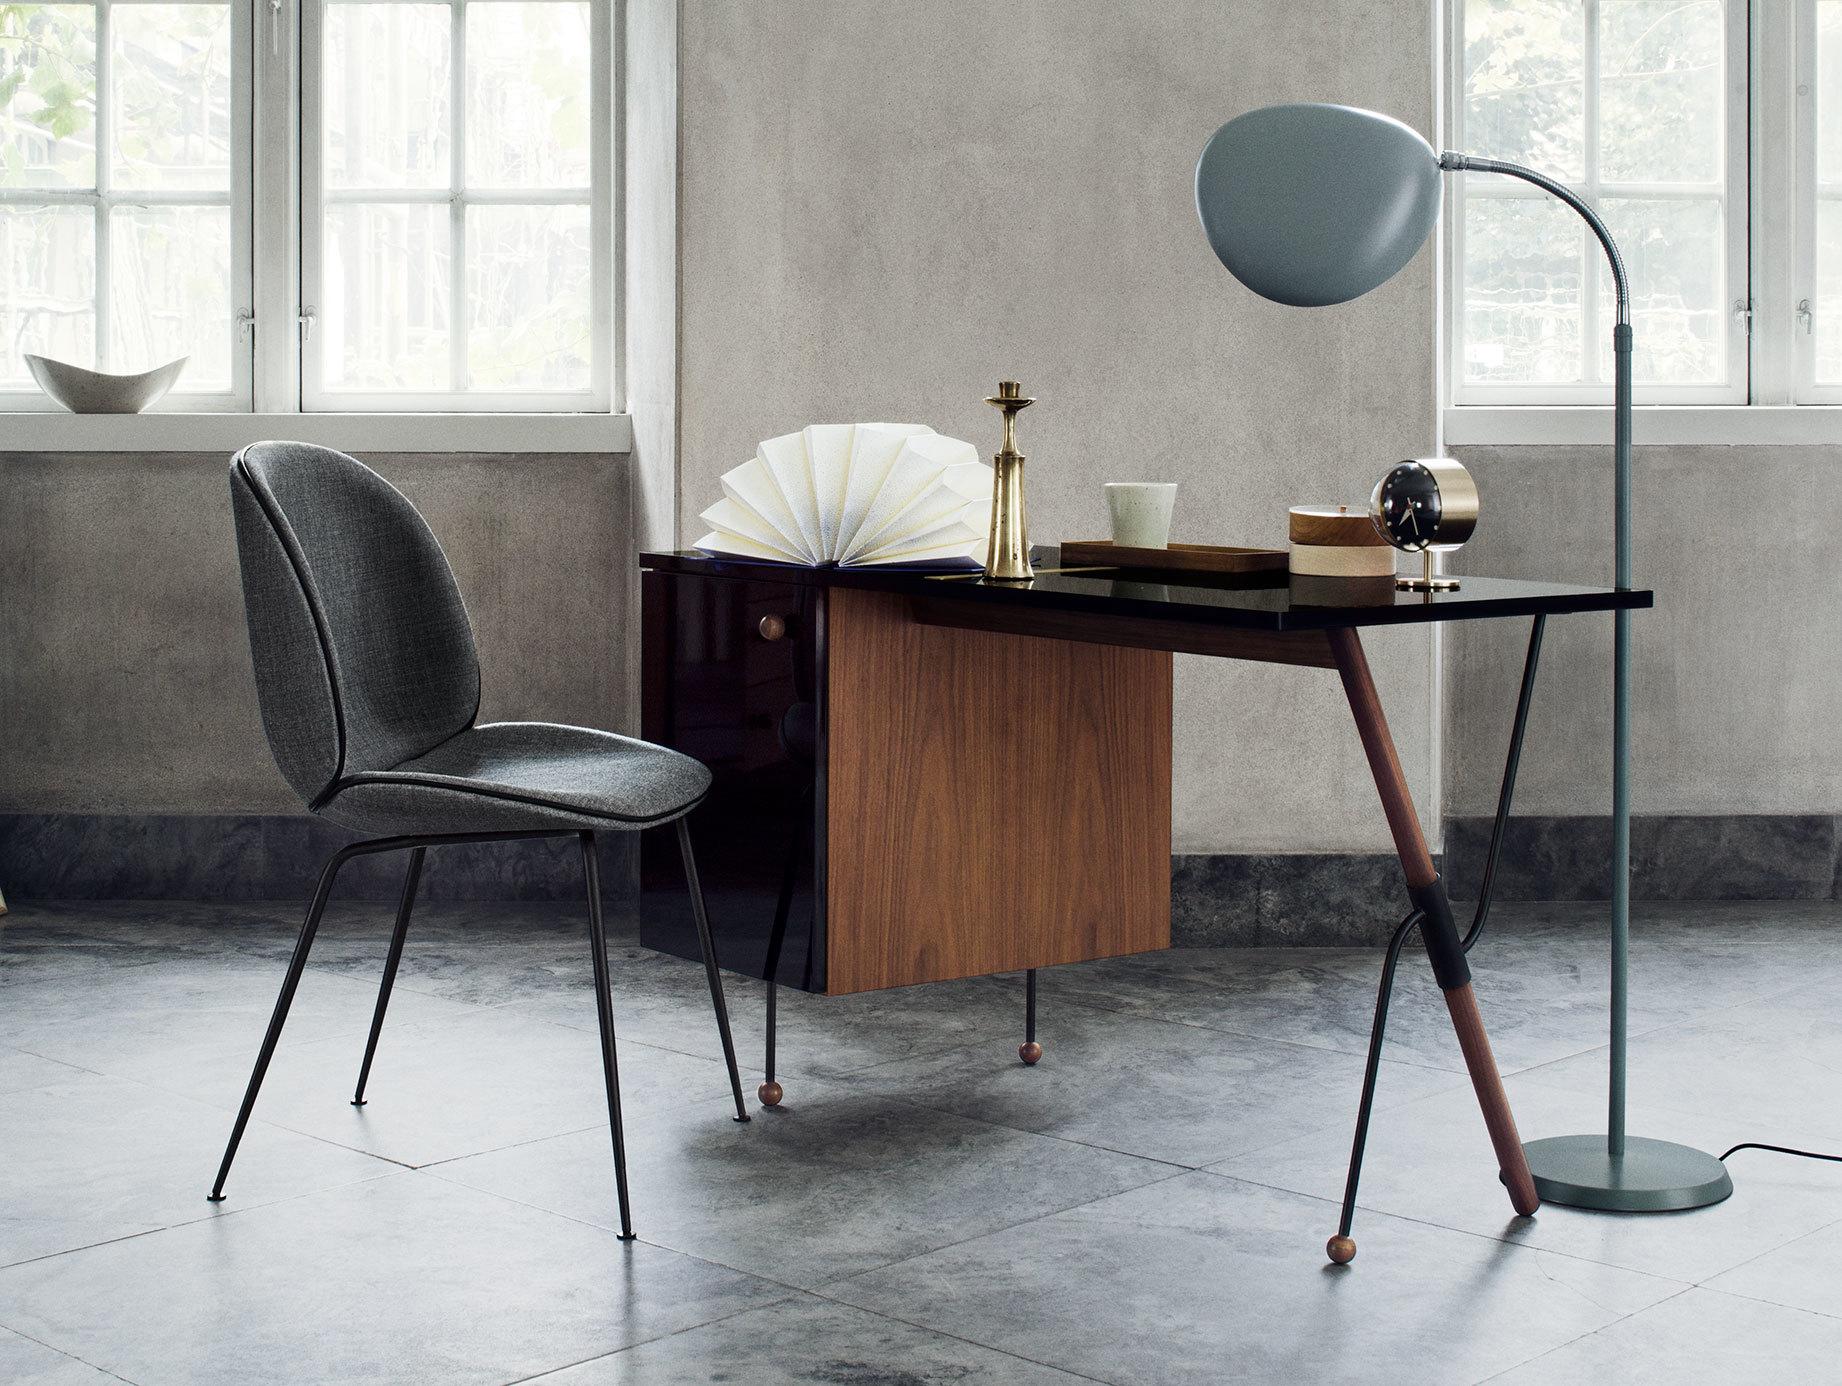 Gubi Beetle Chair Grossman Desk Cobra Floor Lamp